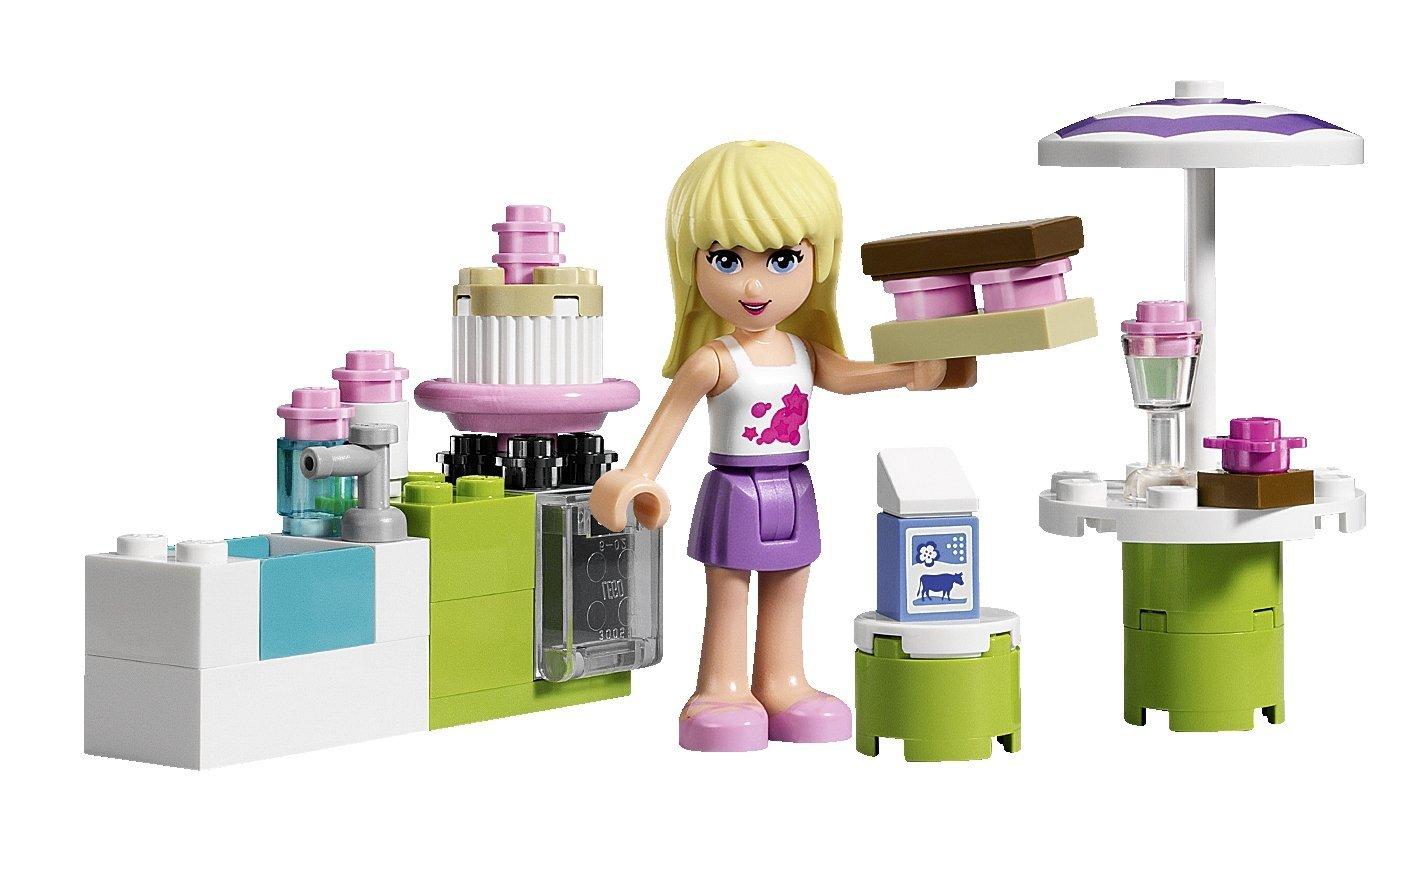 Lego Toys For Girls : My lego style friends stephanie s outdoor bakery